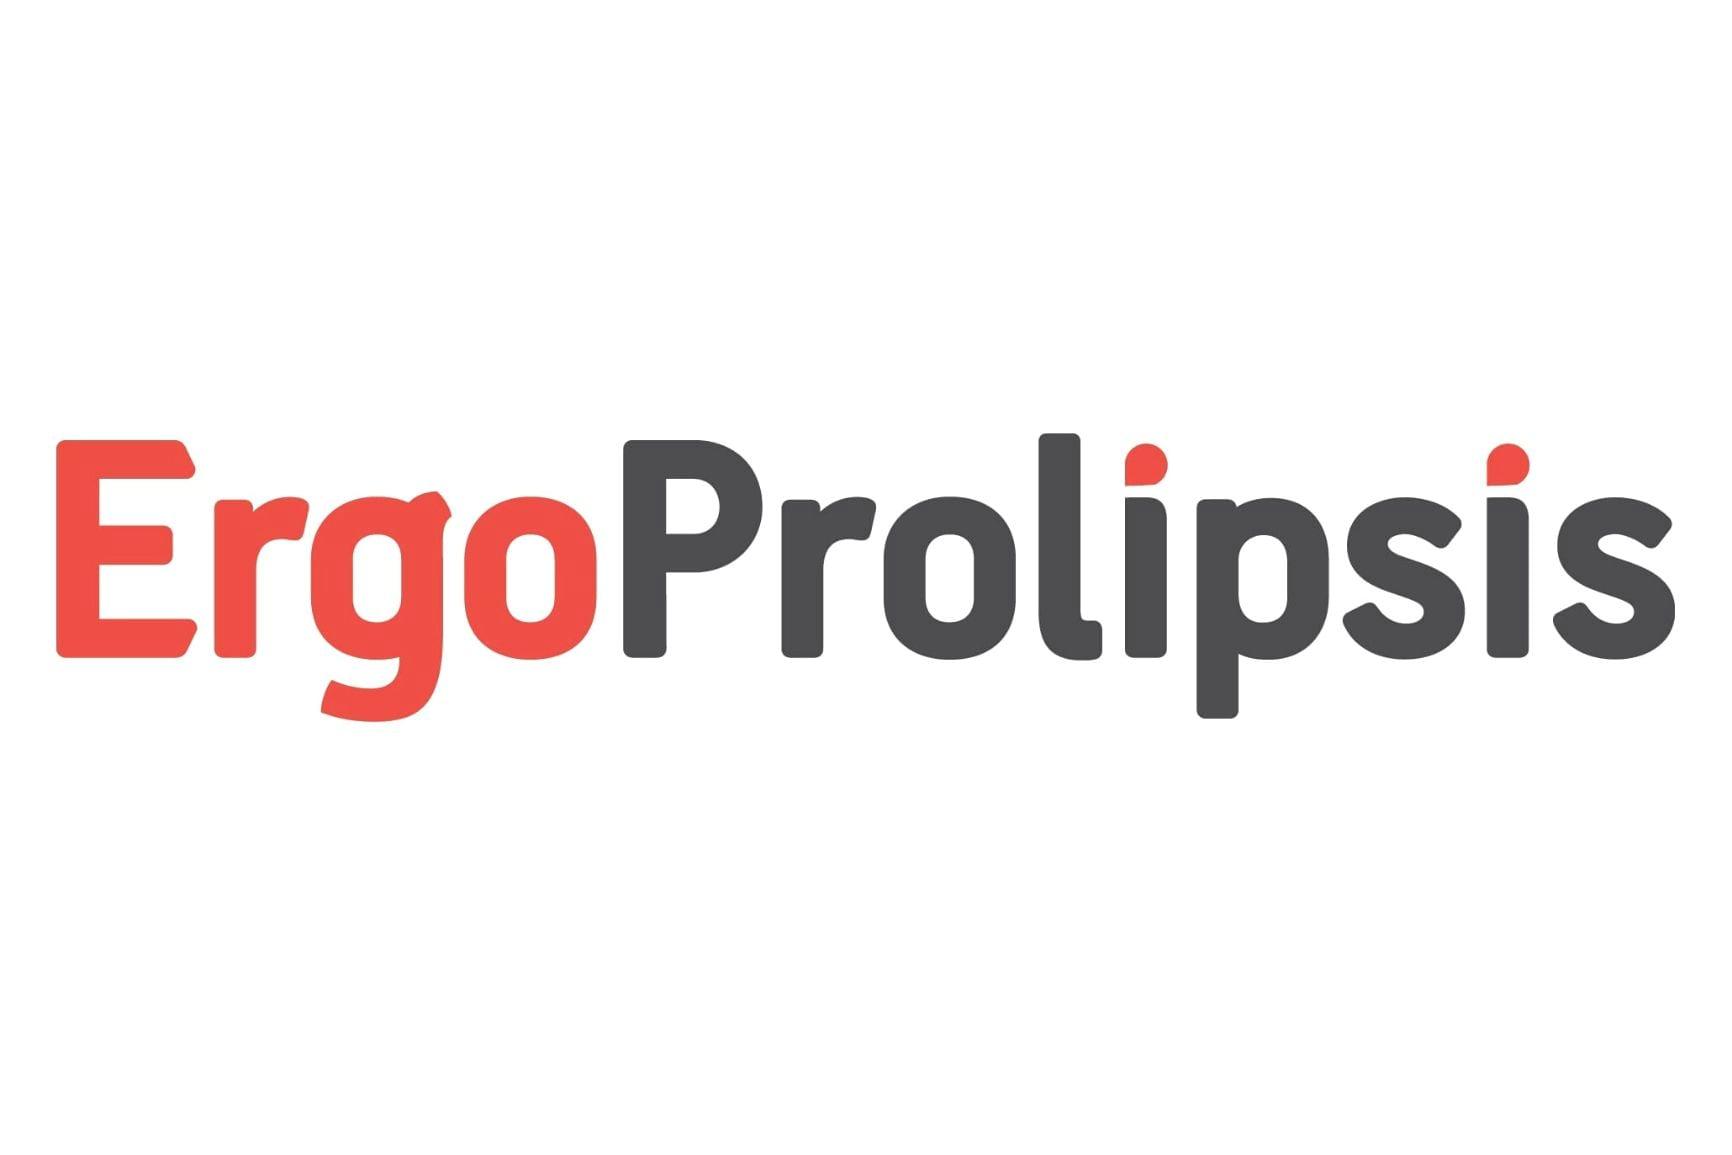 ErgoProlipsis